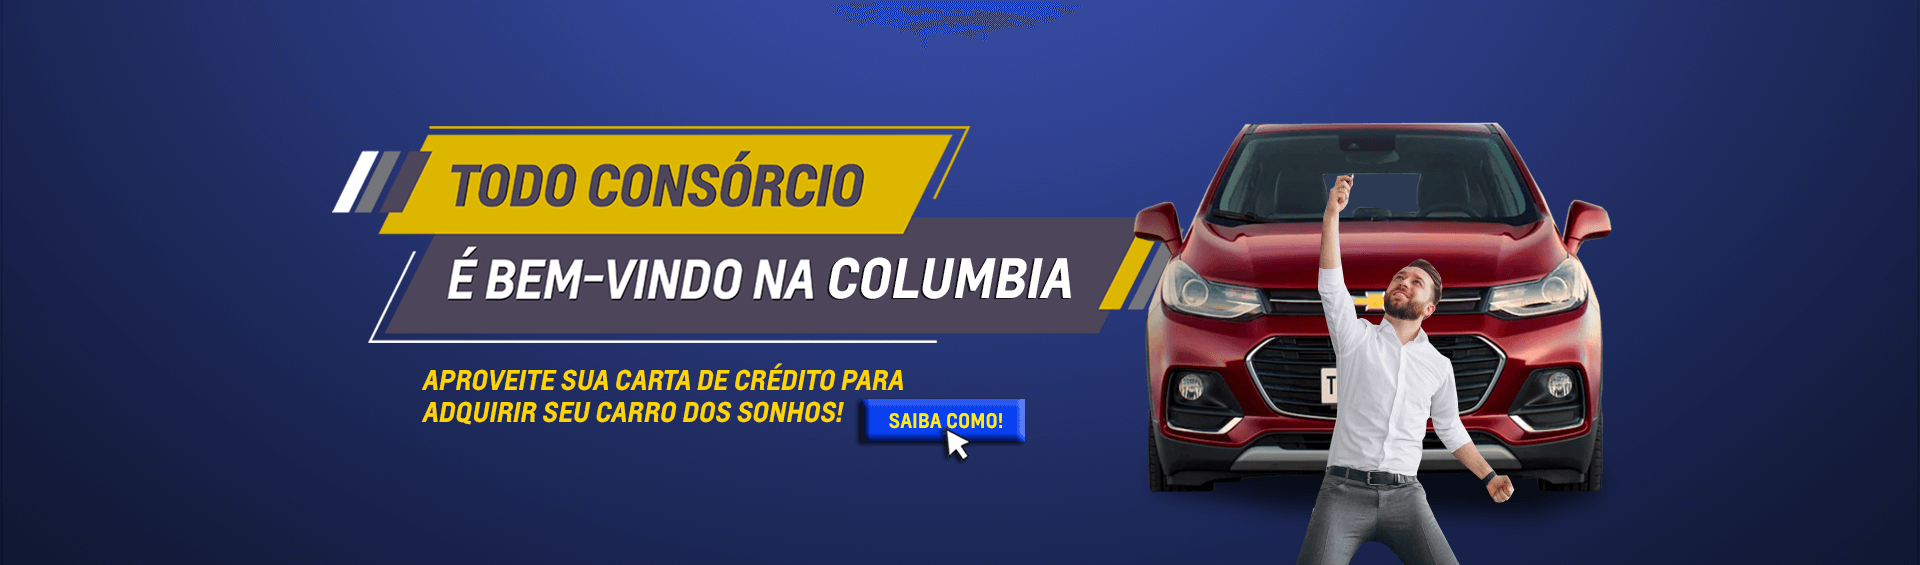 consorcio-columbia